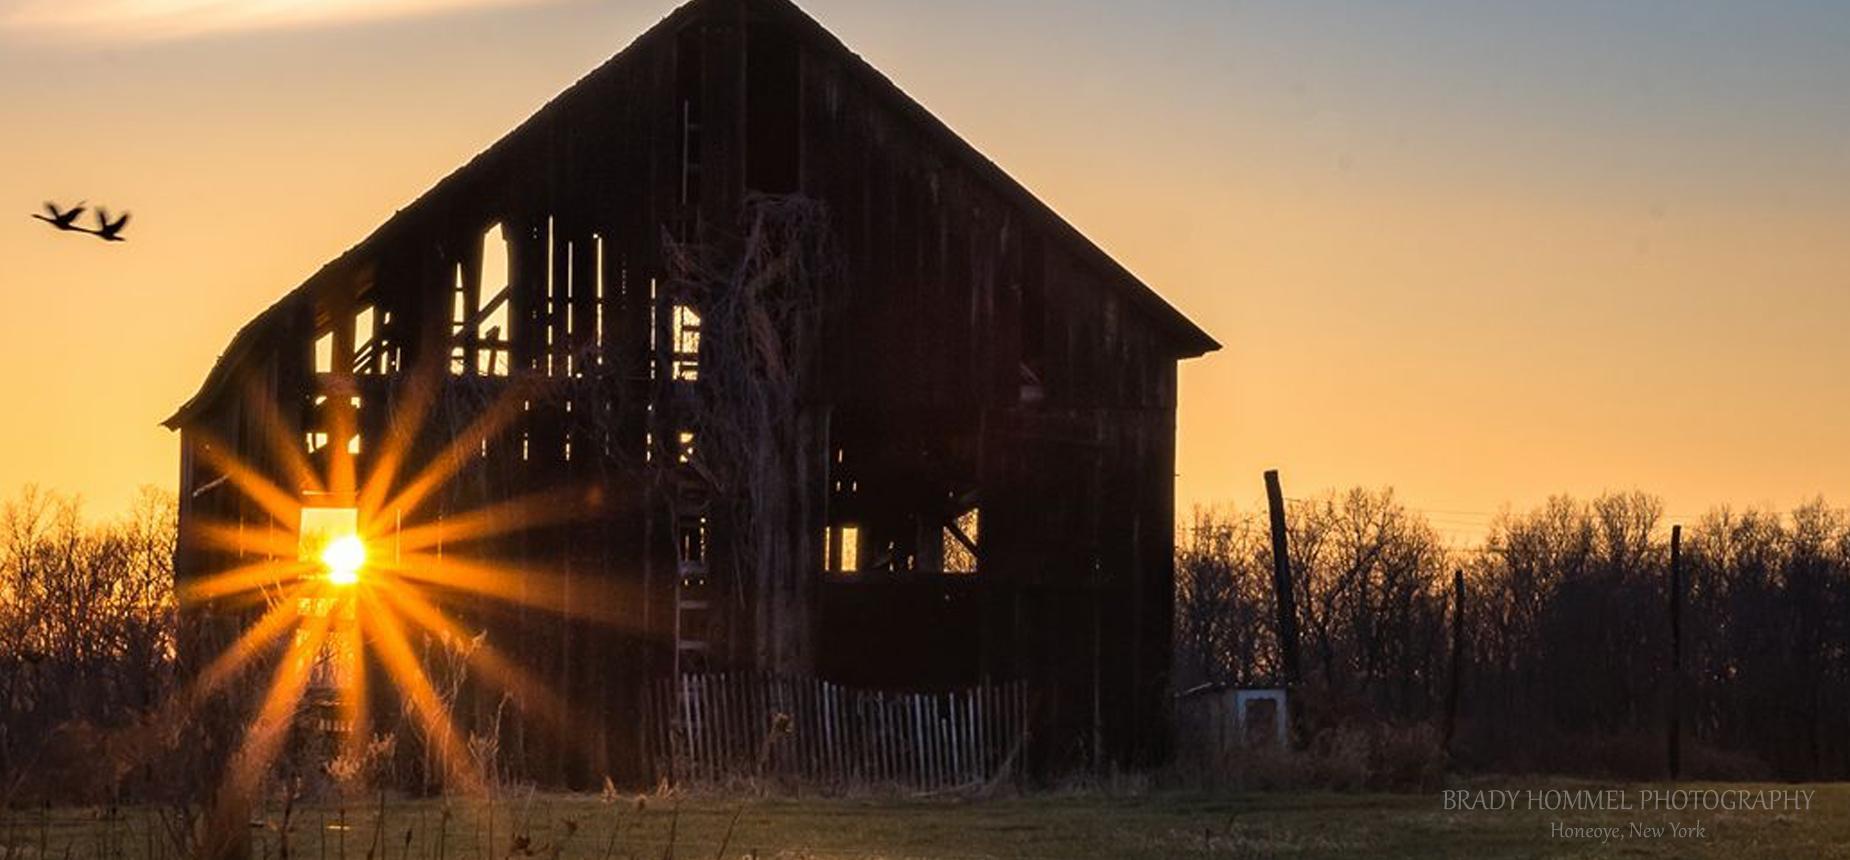 Photograph of Barn and Sun in Honeoye, New York